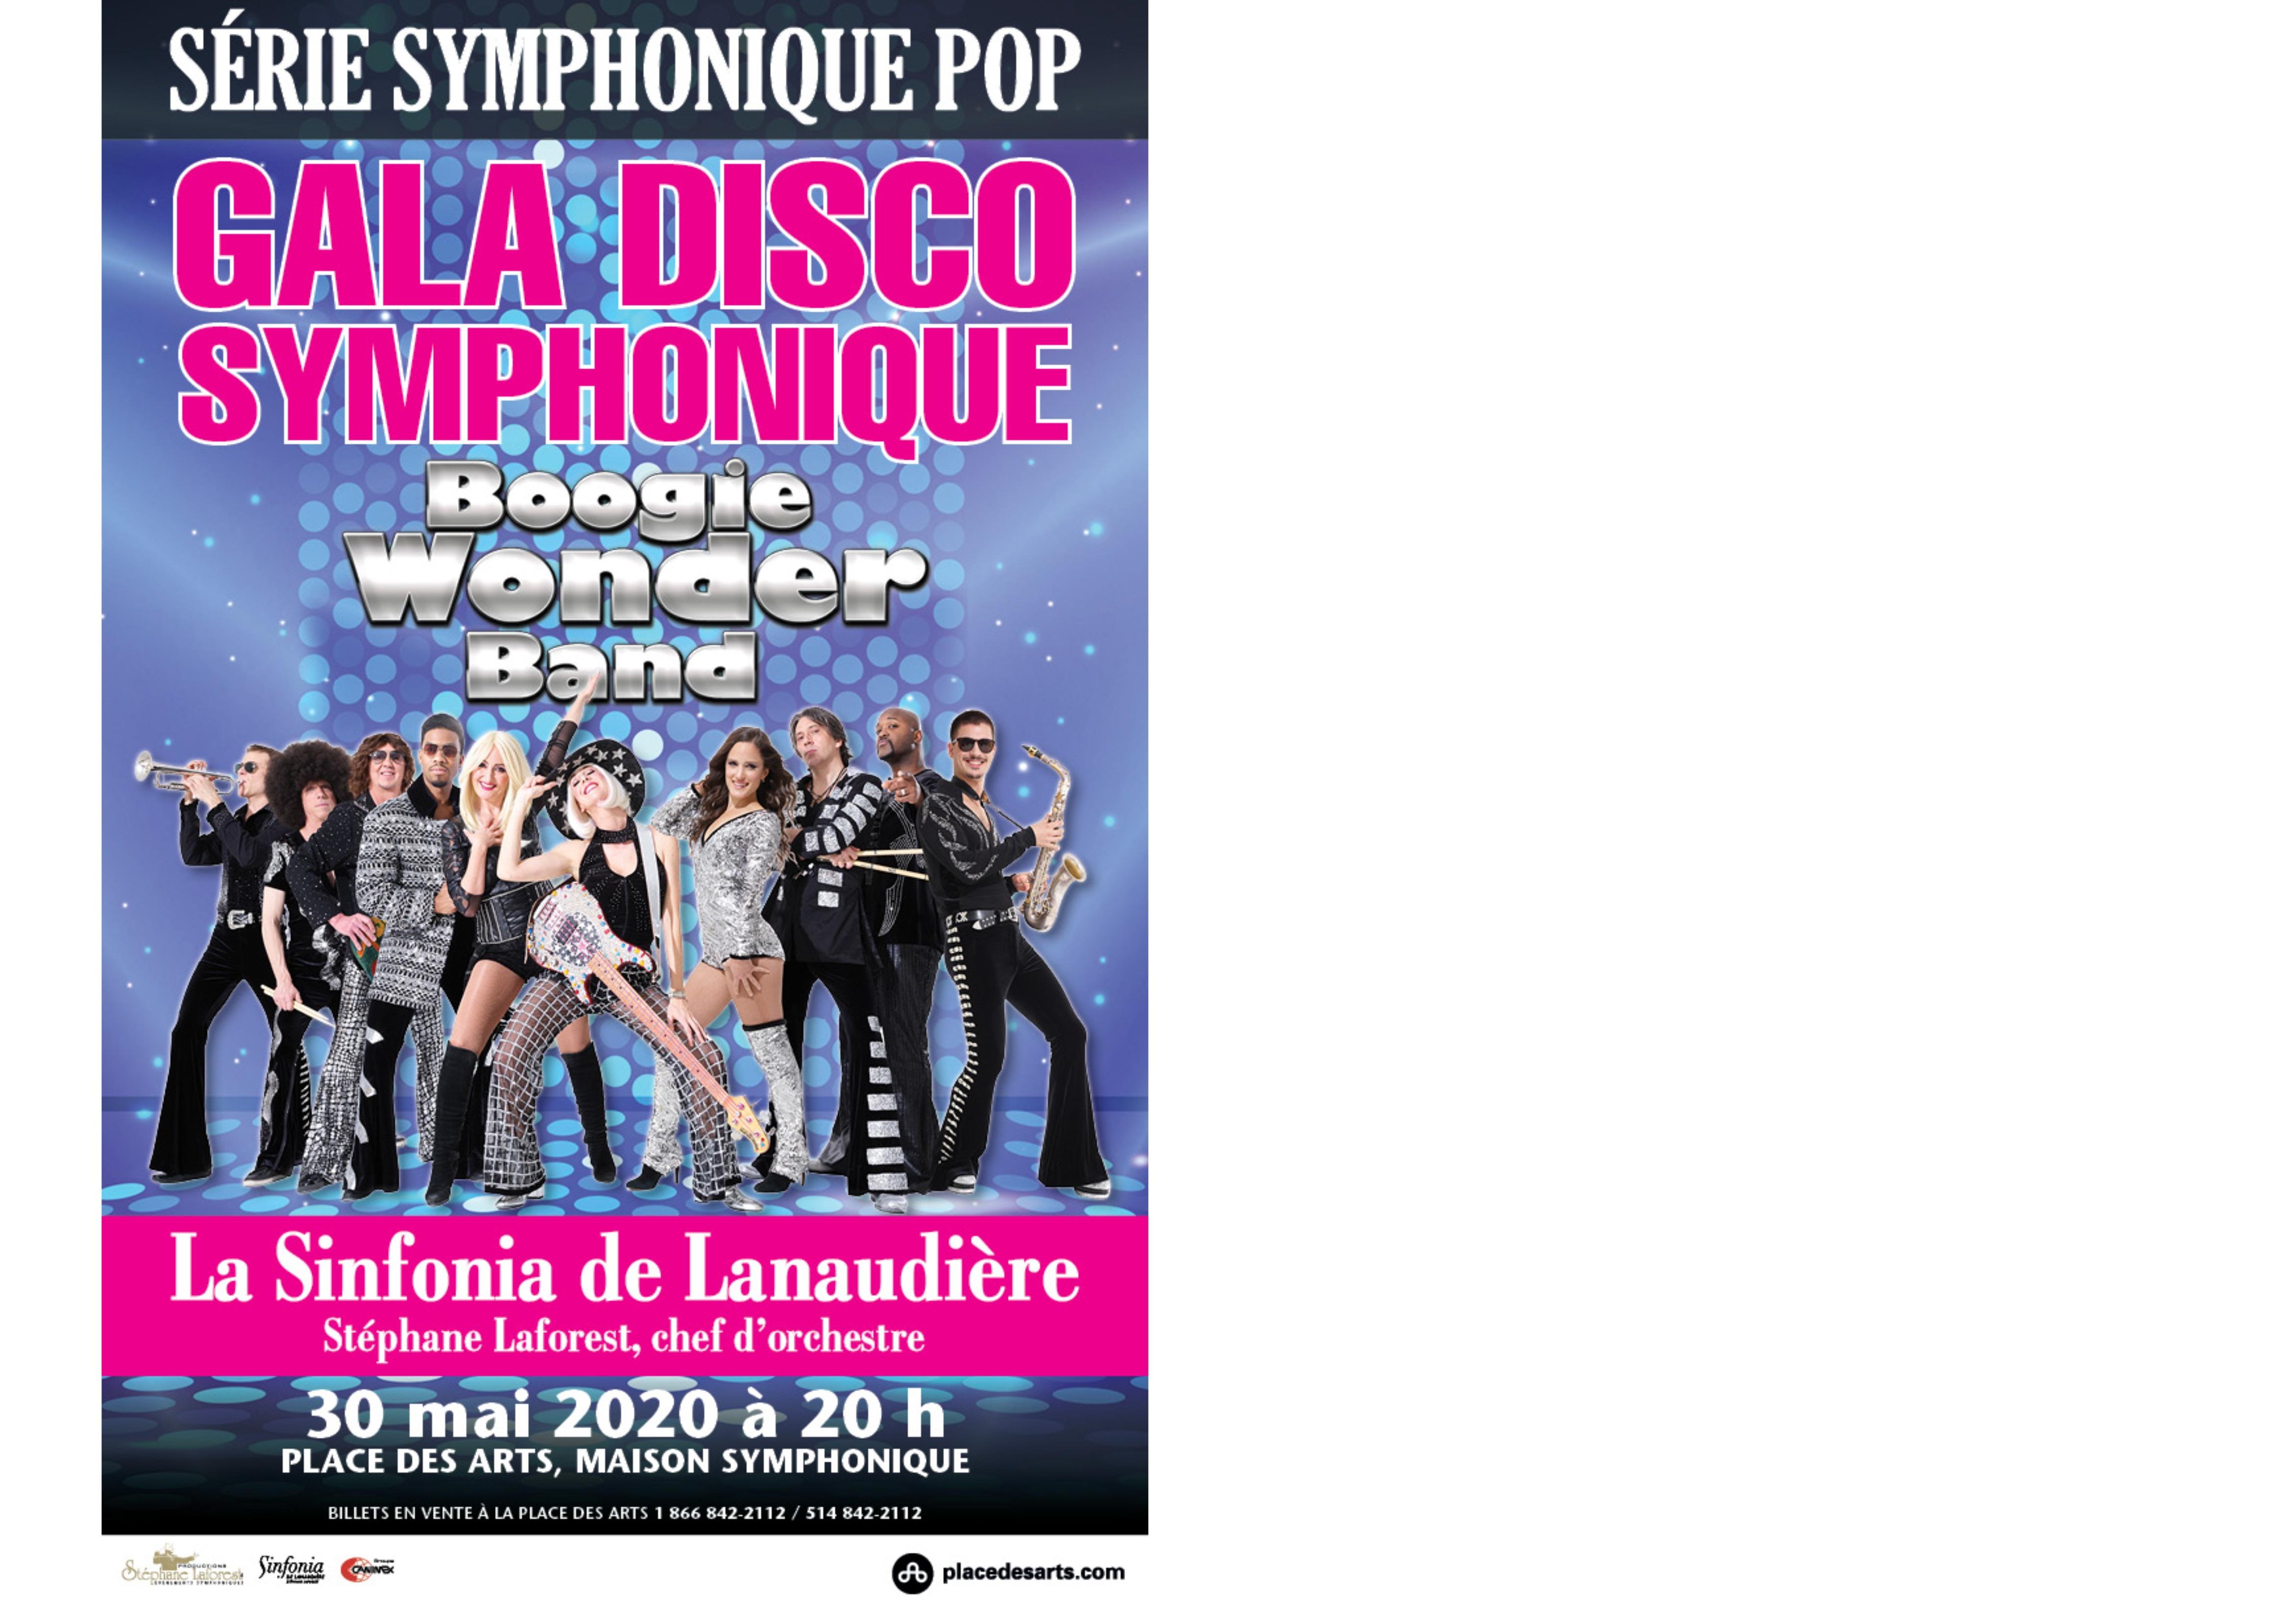 Gala Disco Symphonique